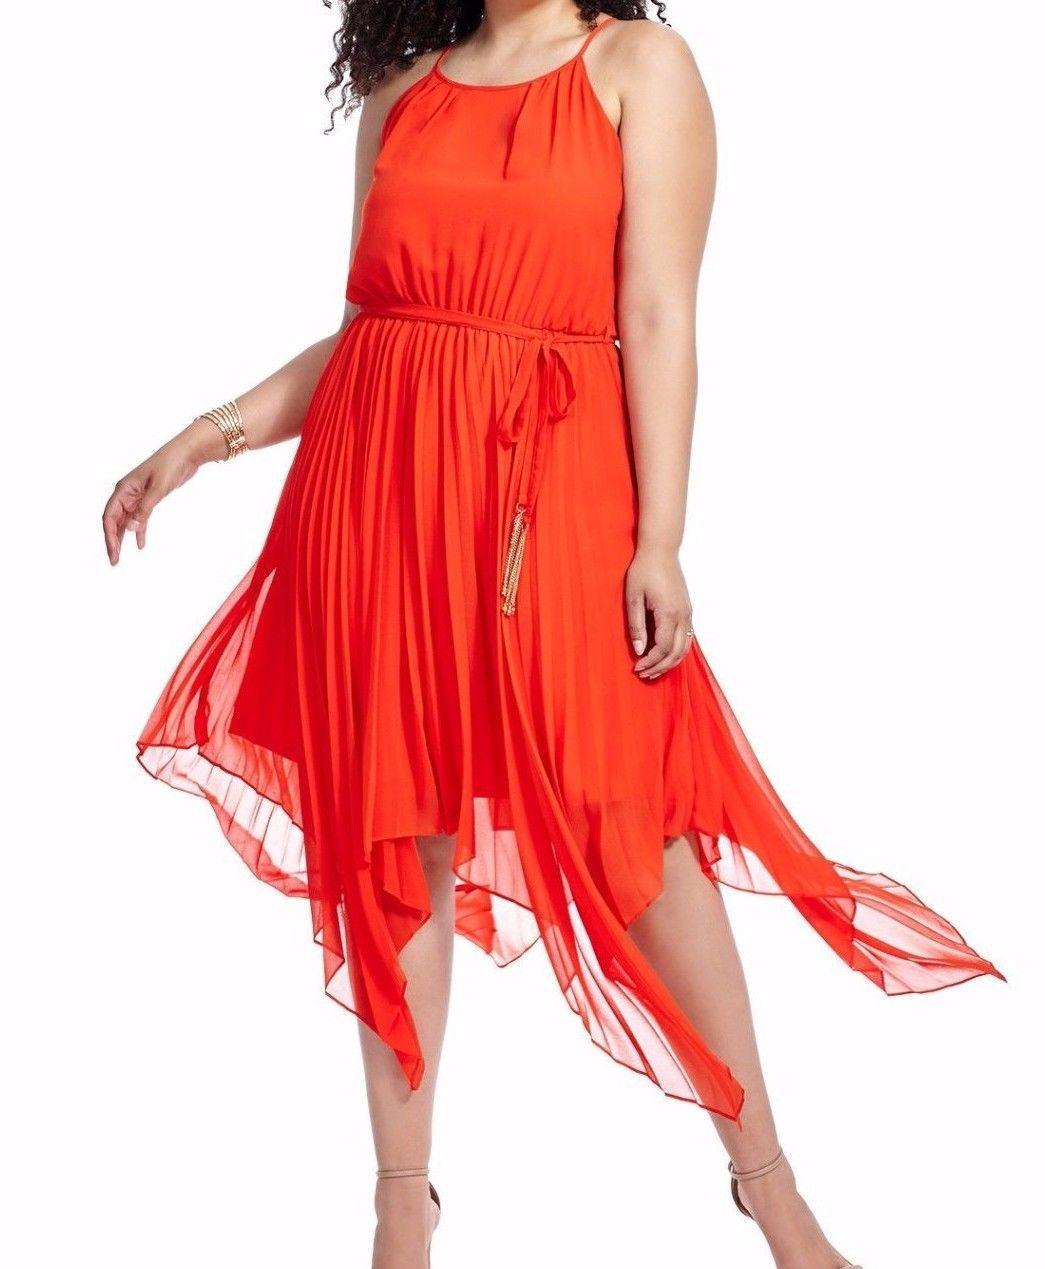 City Chic Sleeveless Chiffon Divine Pleat Maxi Dress In Roguish Red Size XL   maxi  dress  roguish  size  pleat  divine  chic  sleeveless  chiffon  city 44d83b11e